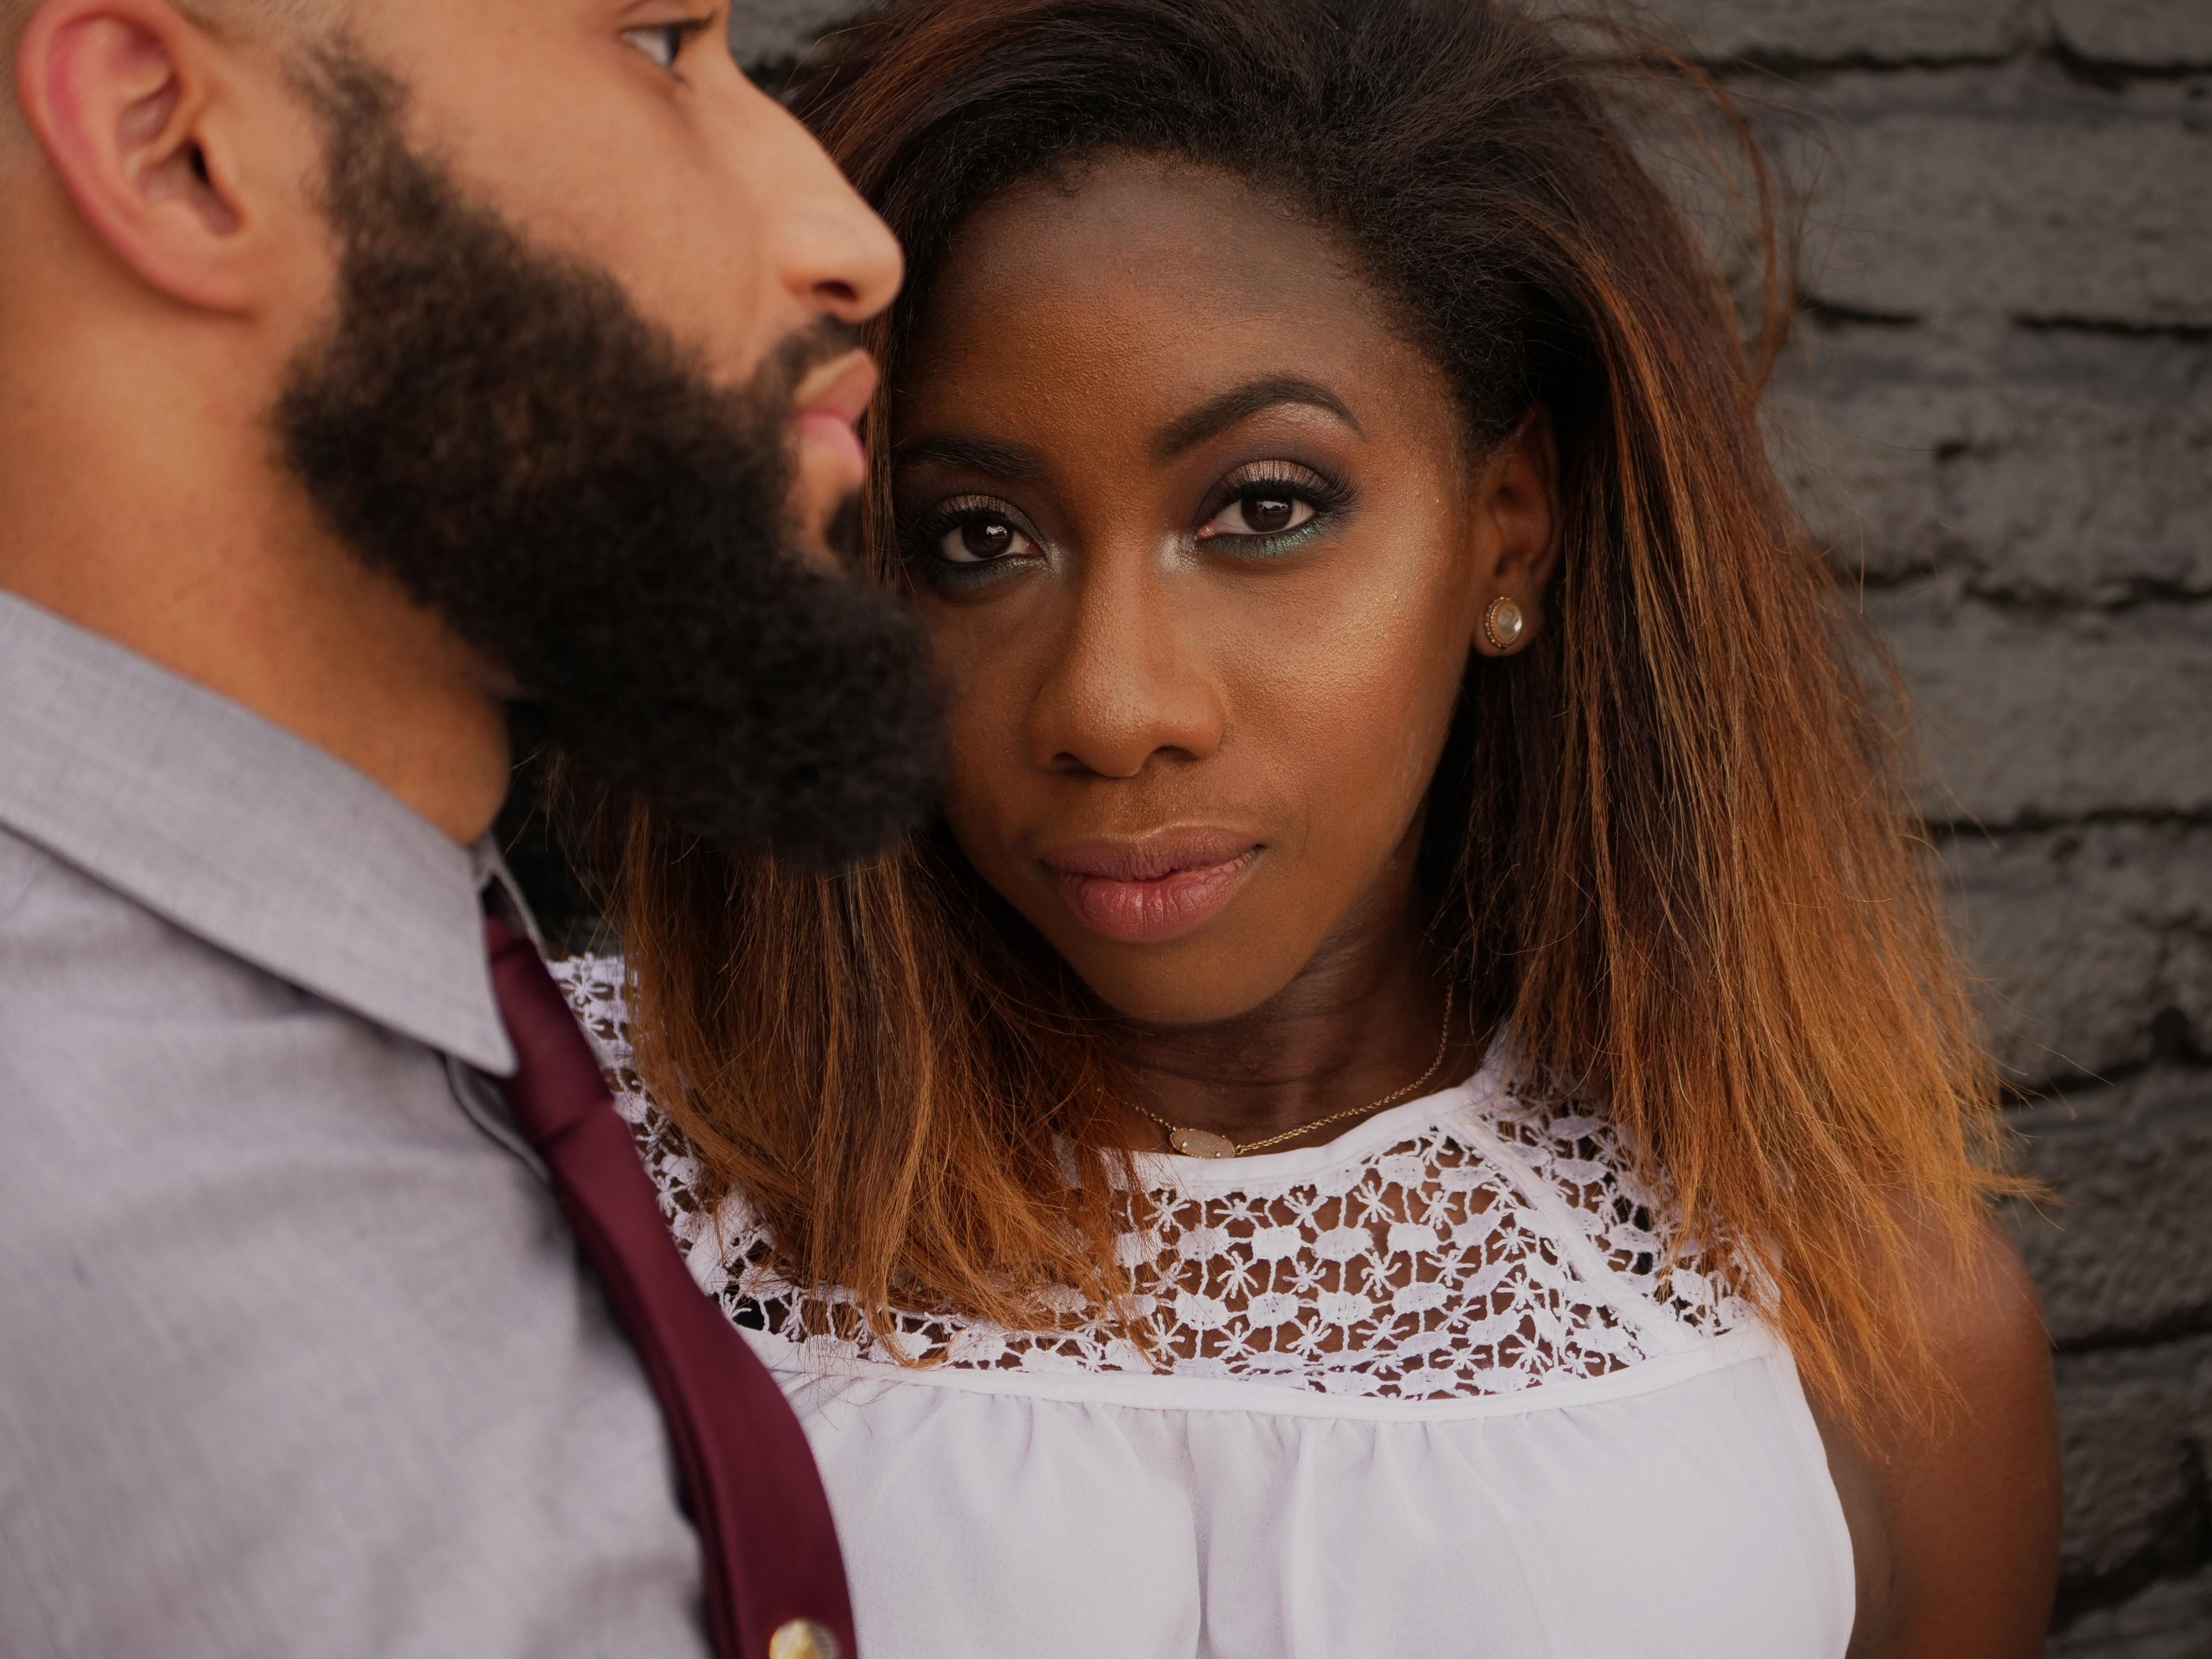 P.I.C.K. a Partner: How to Avoid Falling